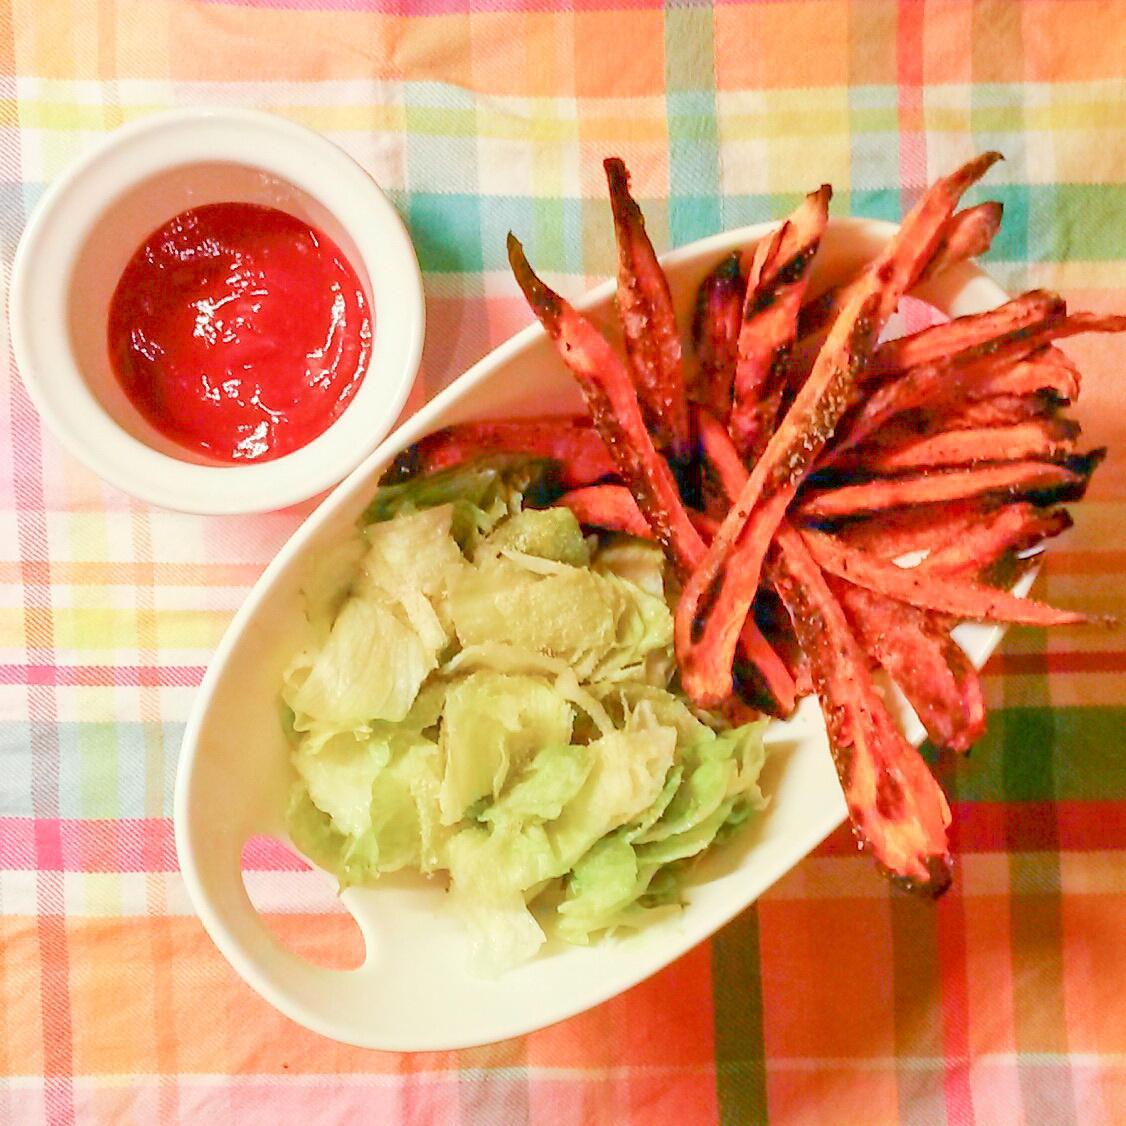 Édesburgony chips salátával